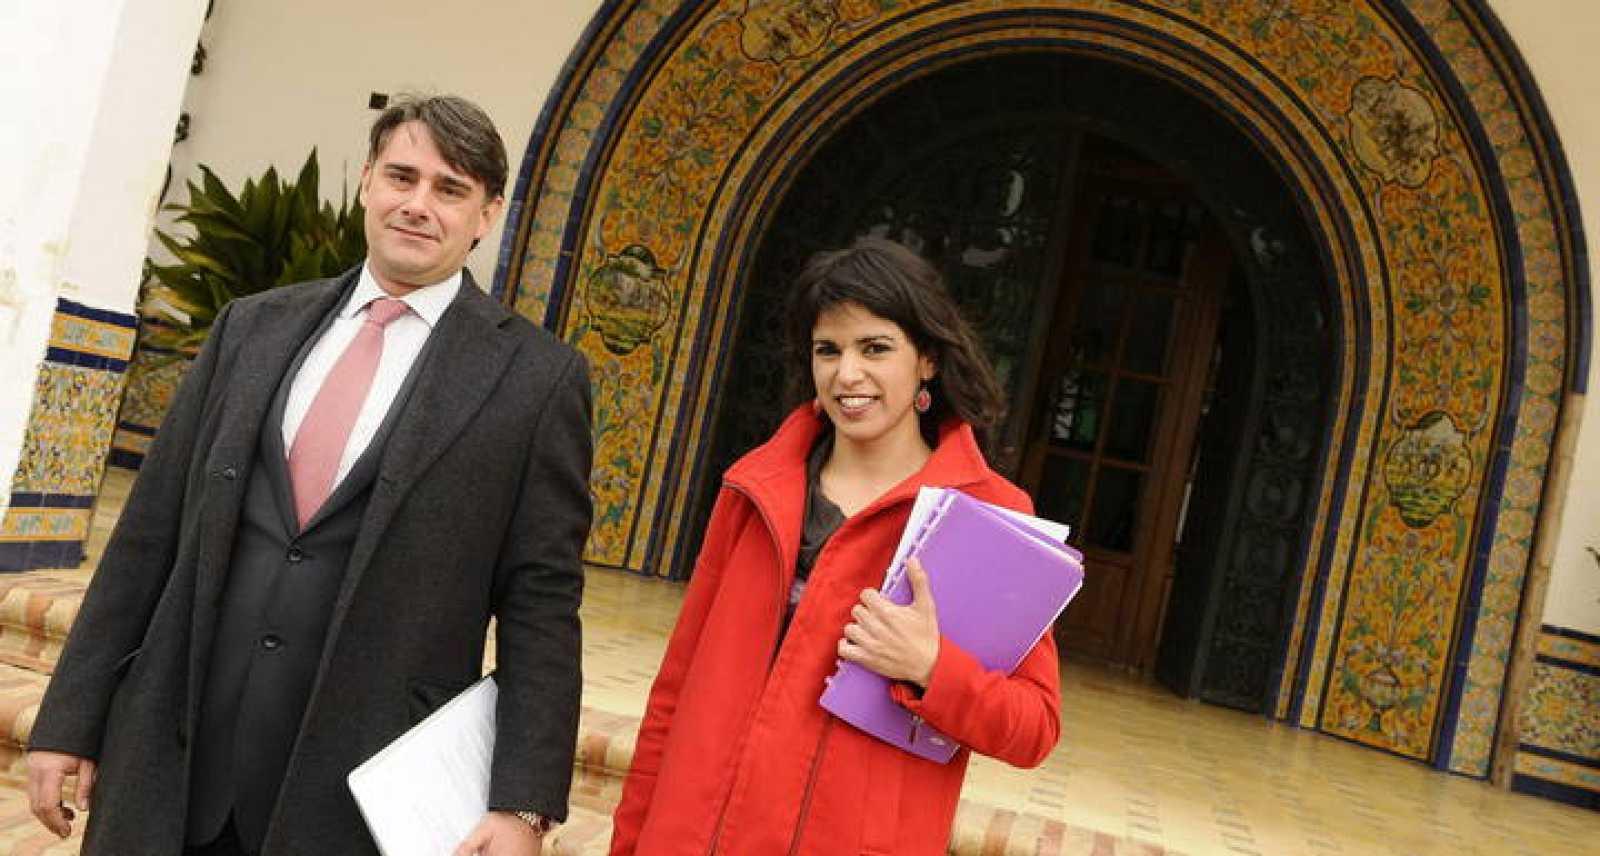 La candidata de Podemos a la Junta de Andalucía, Teresa Rodríguez, que optará por la provincia de Cádiz.